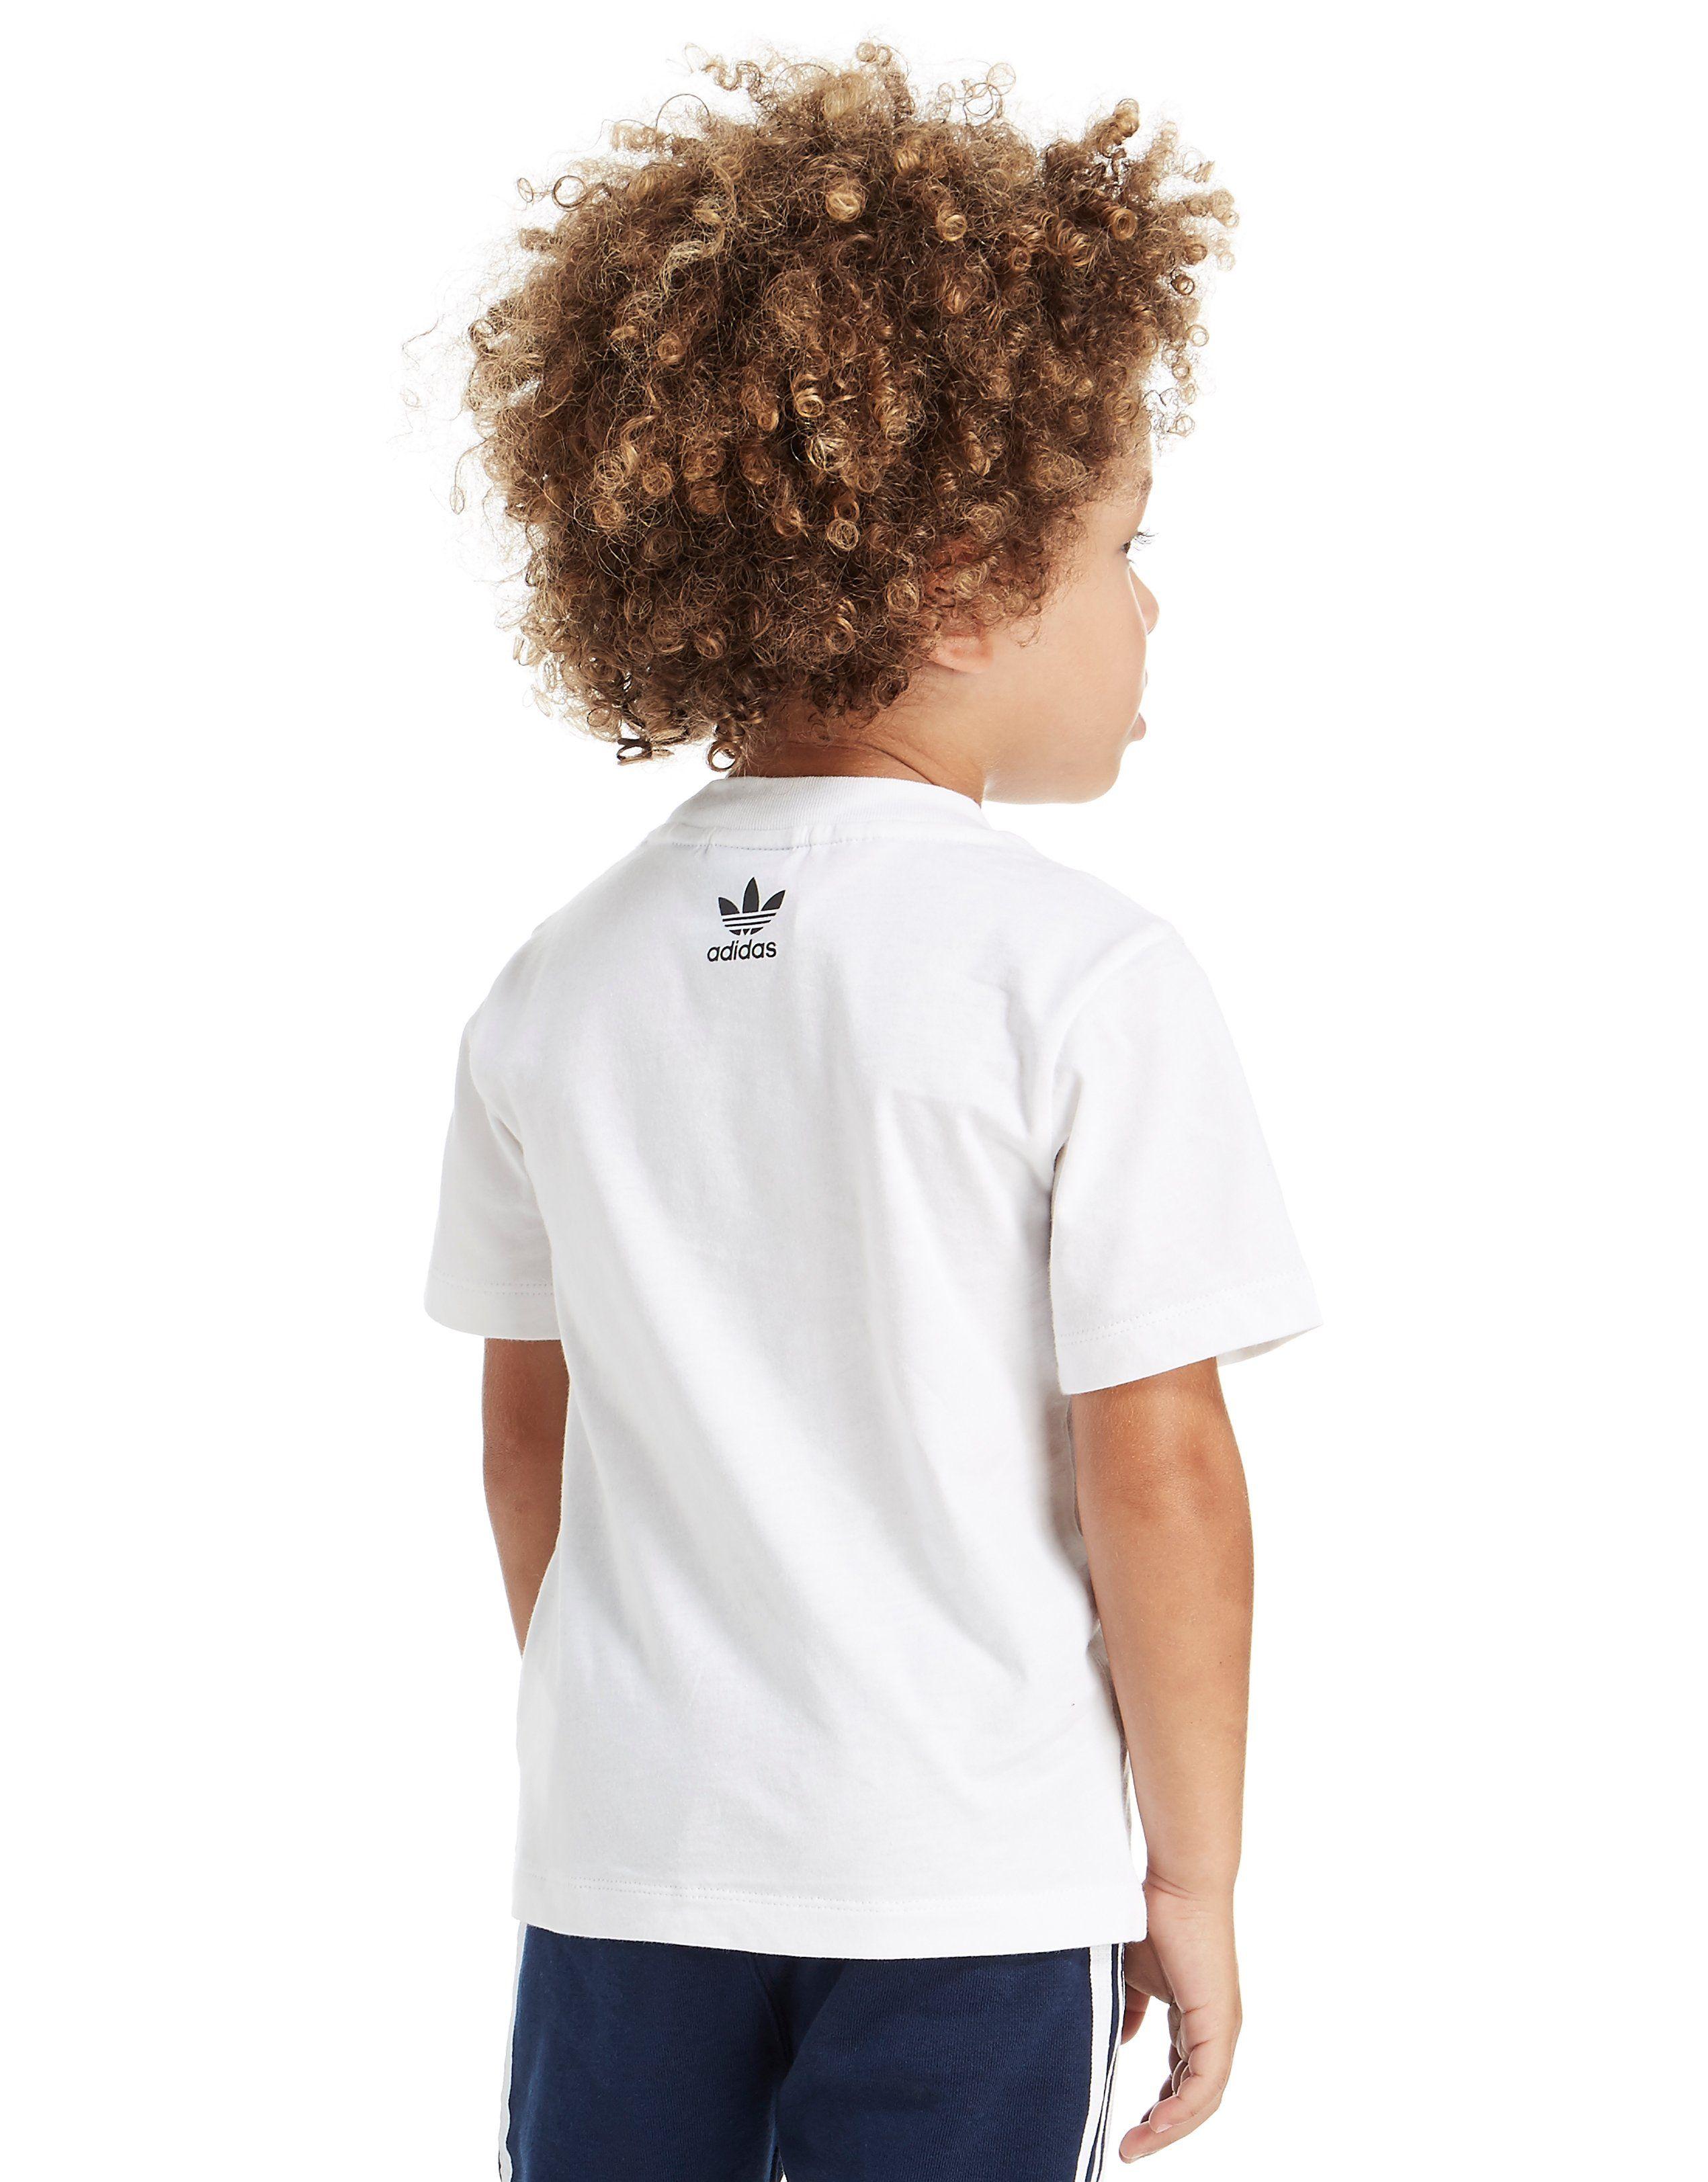 adidas Originals Trefoil Series T-Shirt Infant